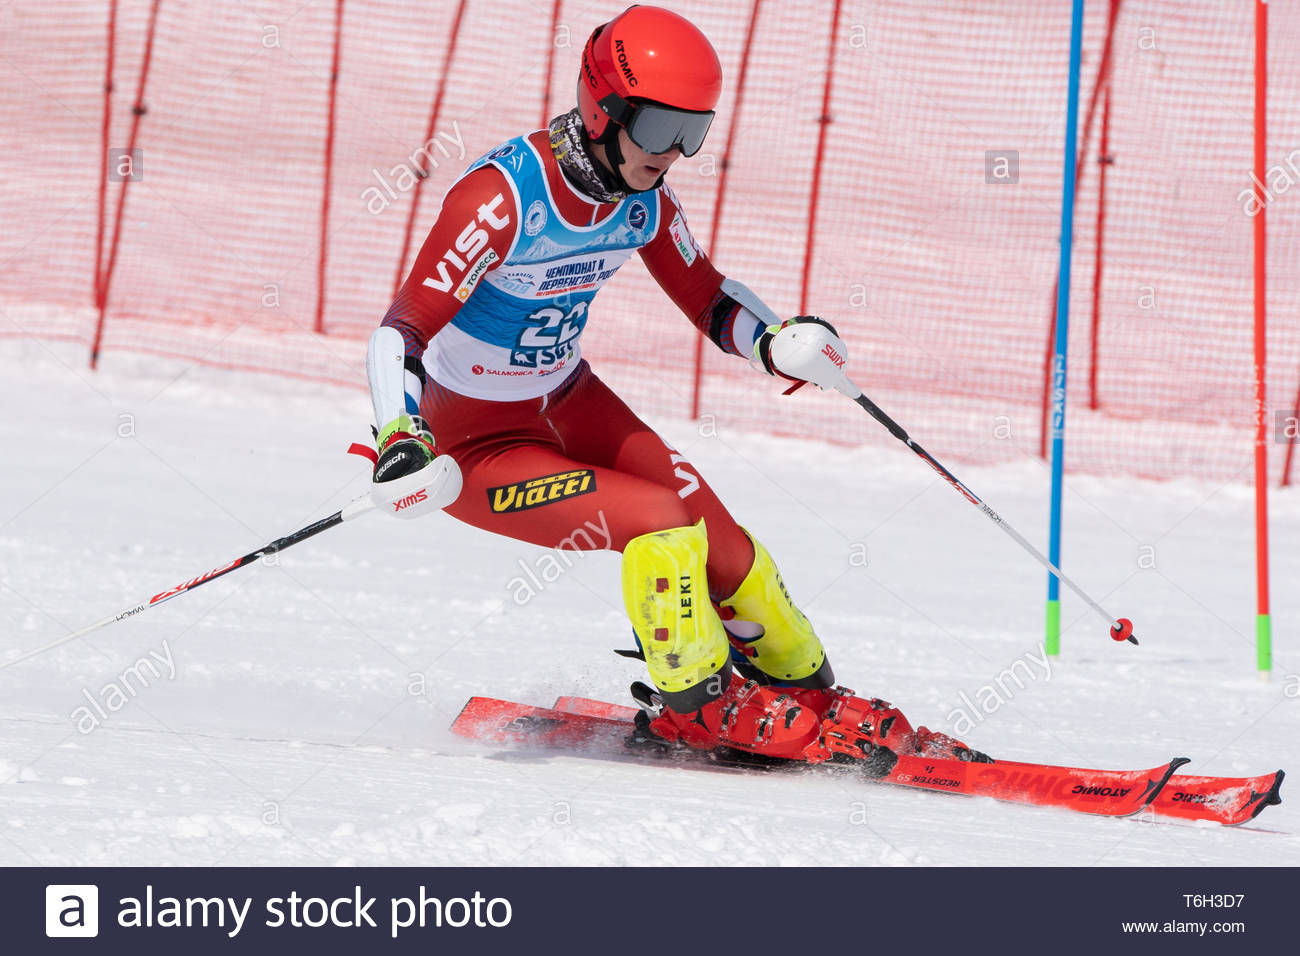 MOROZNAYA MOUNTAIN, KAMCHATKA, RUSSIA - MAR 28, 2019: International Ski Federation Championship, Russian Alpine Skiing Cup, slalom. Mountain skier Vla Stock Photo